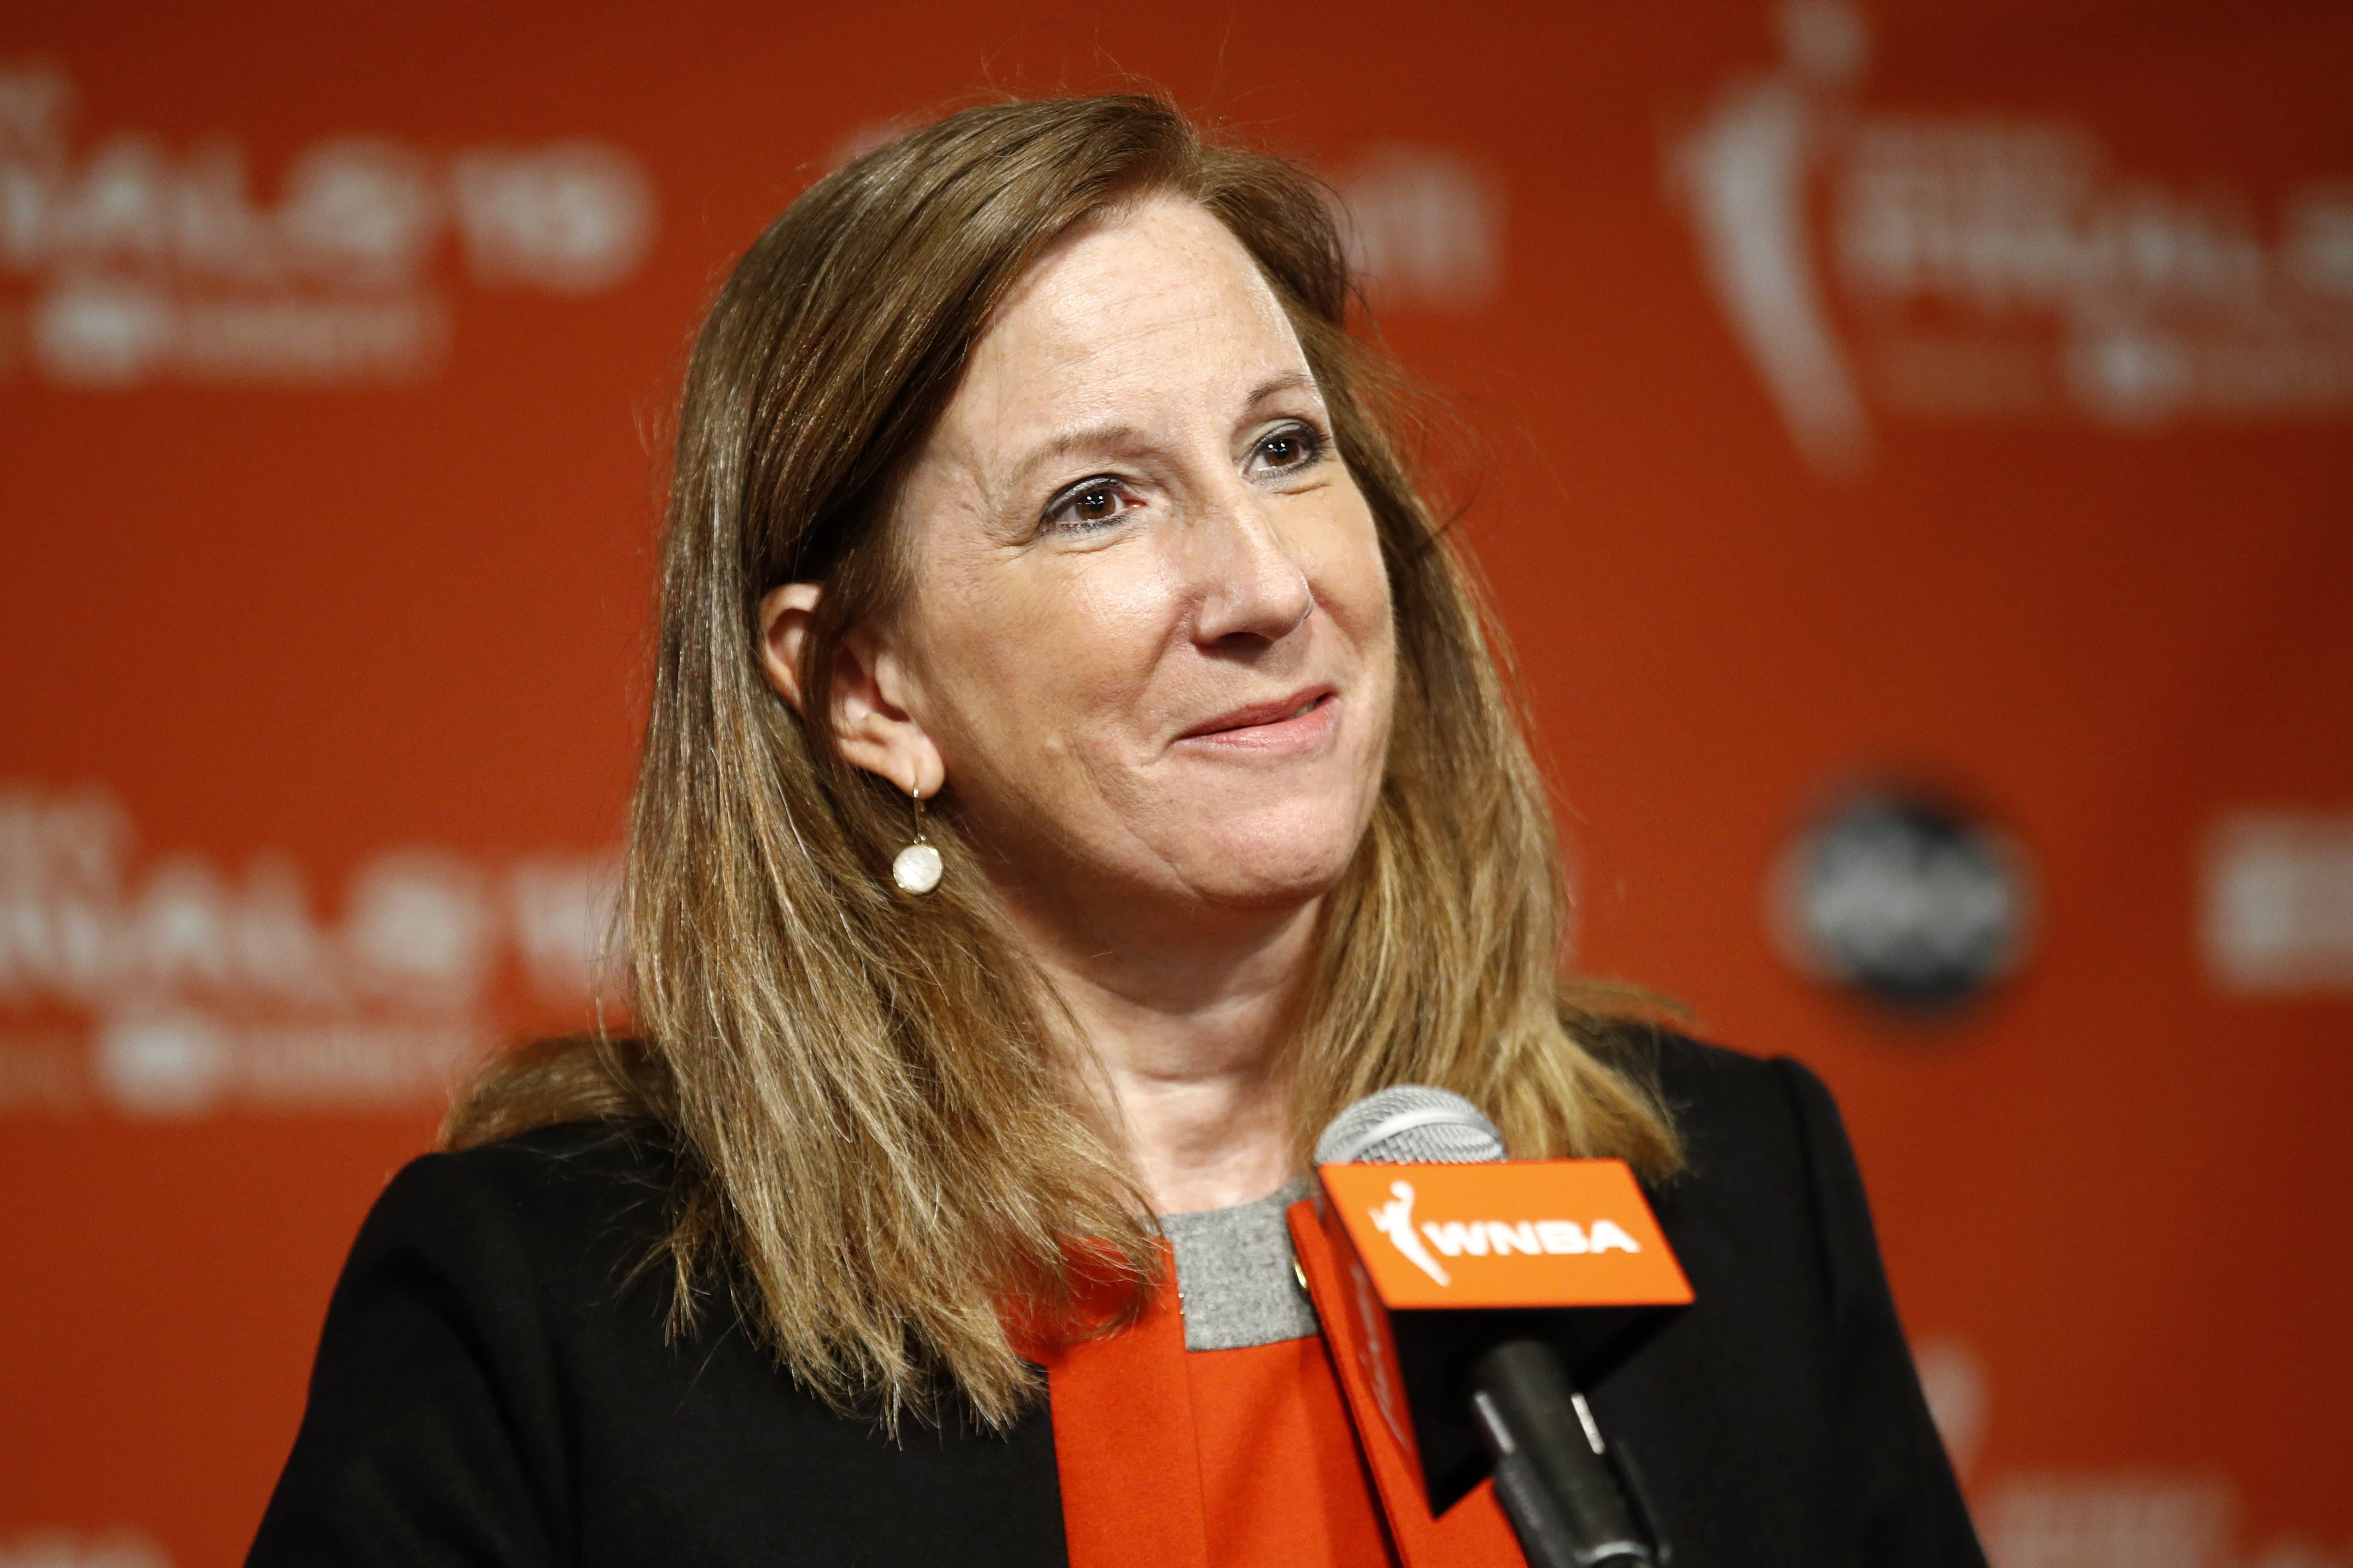 WNBA commissioner: 'We have a marketing problem'